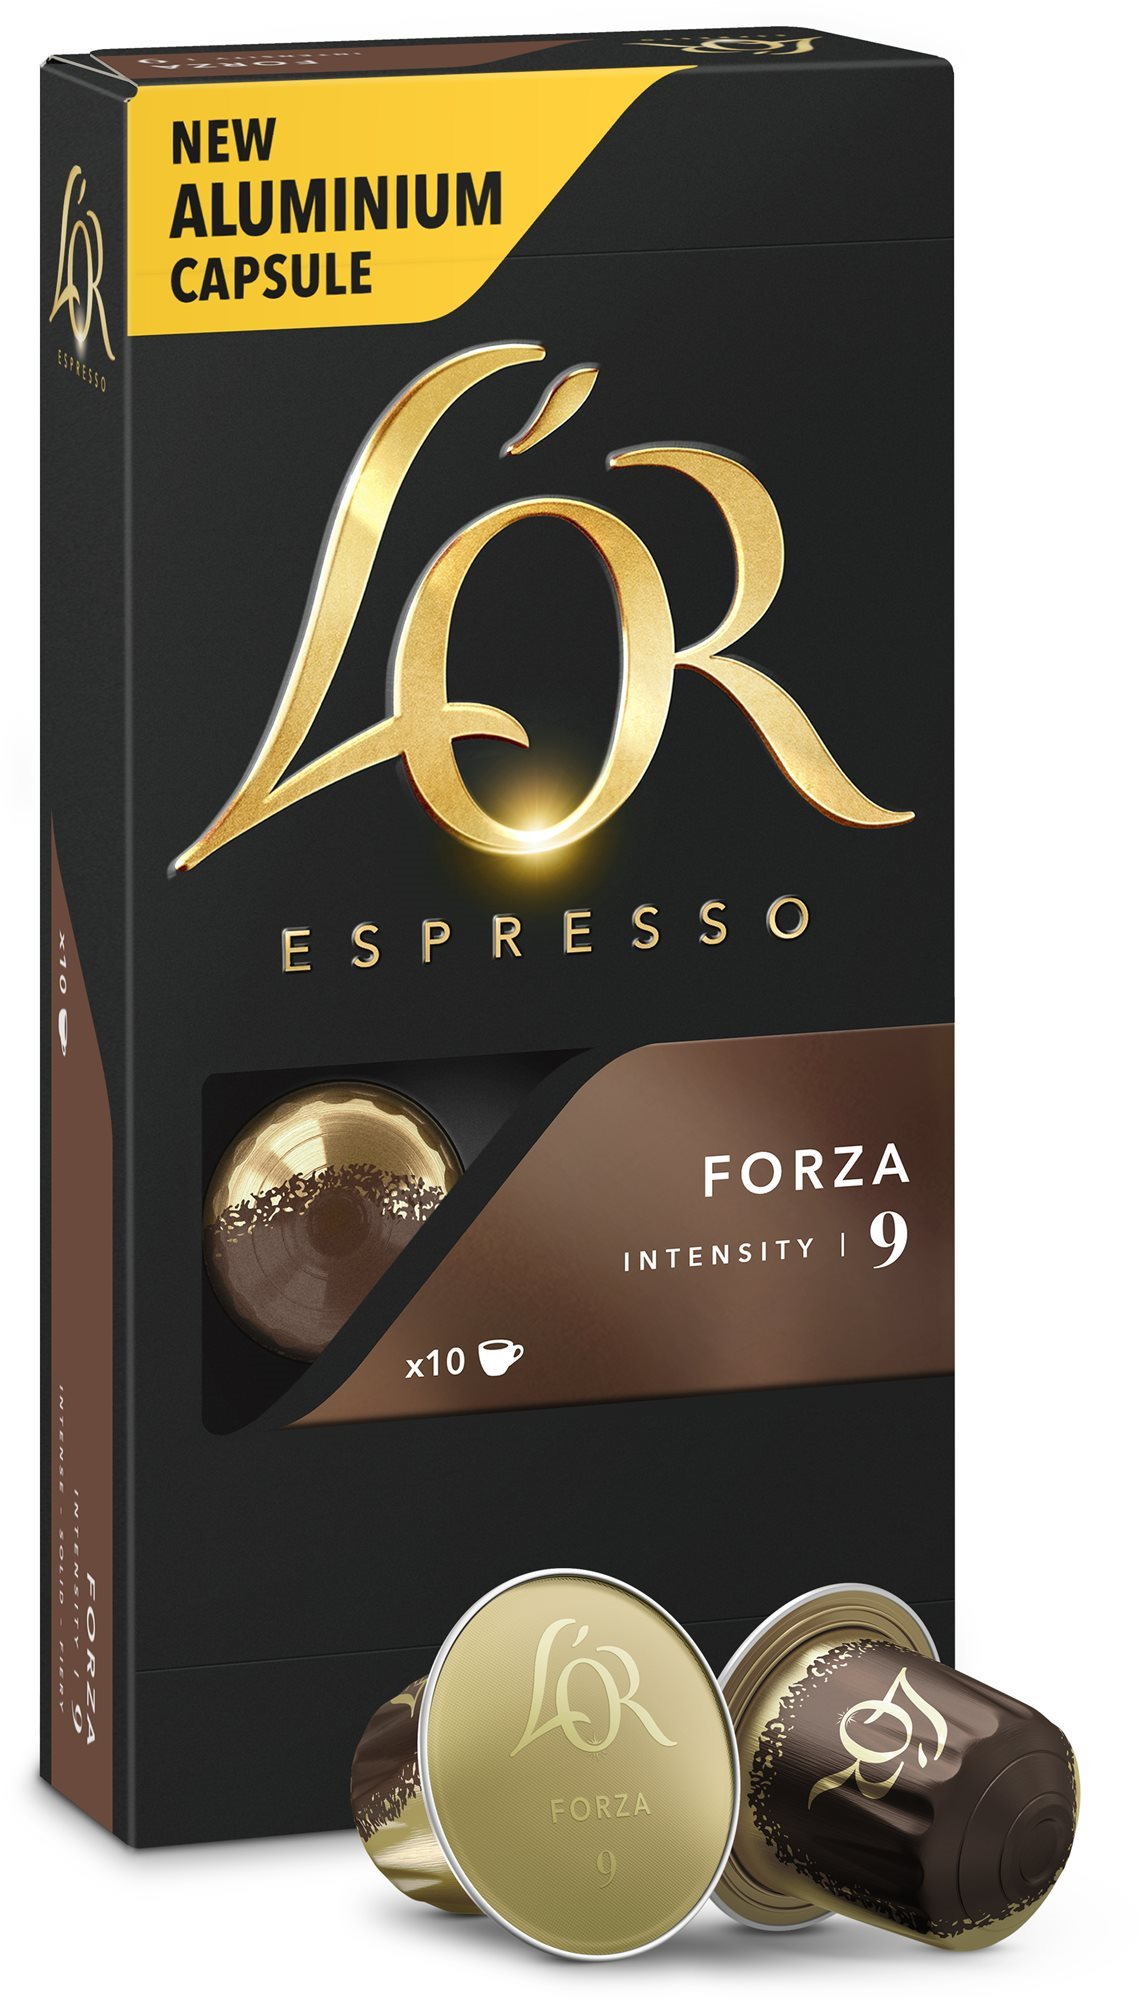 L'OR Espresso Forza 10 db alumínium kapszula